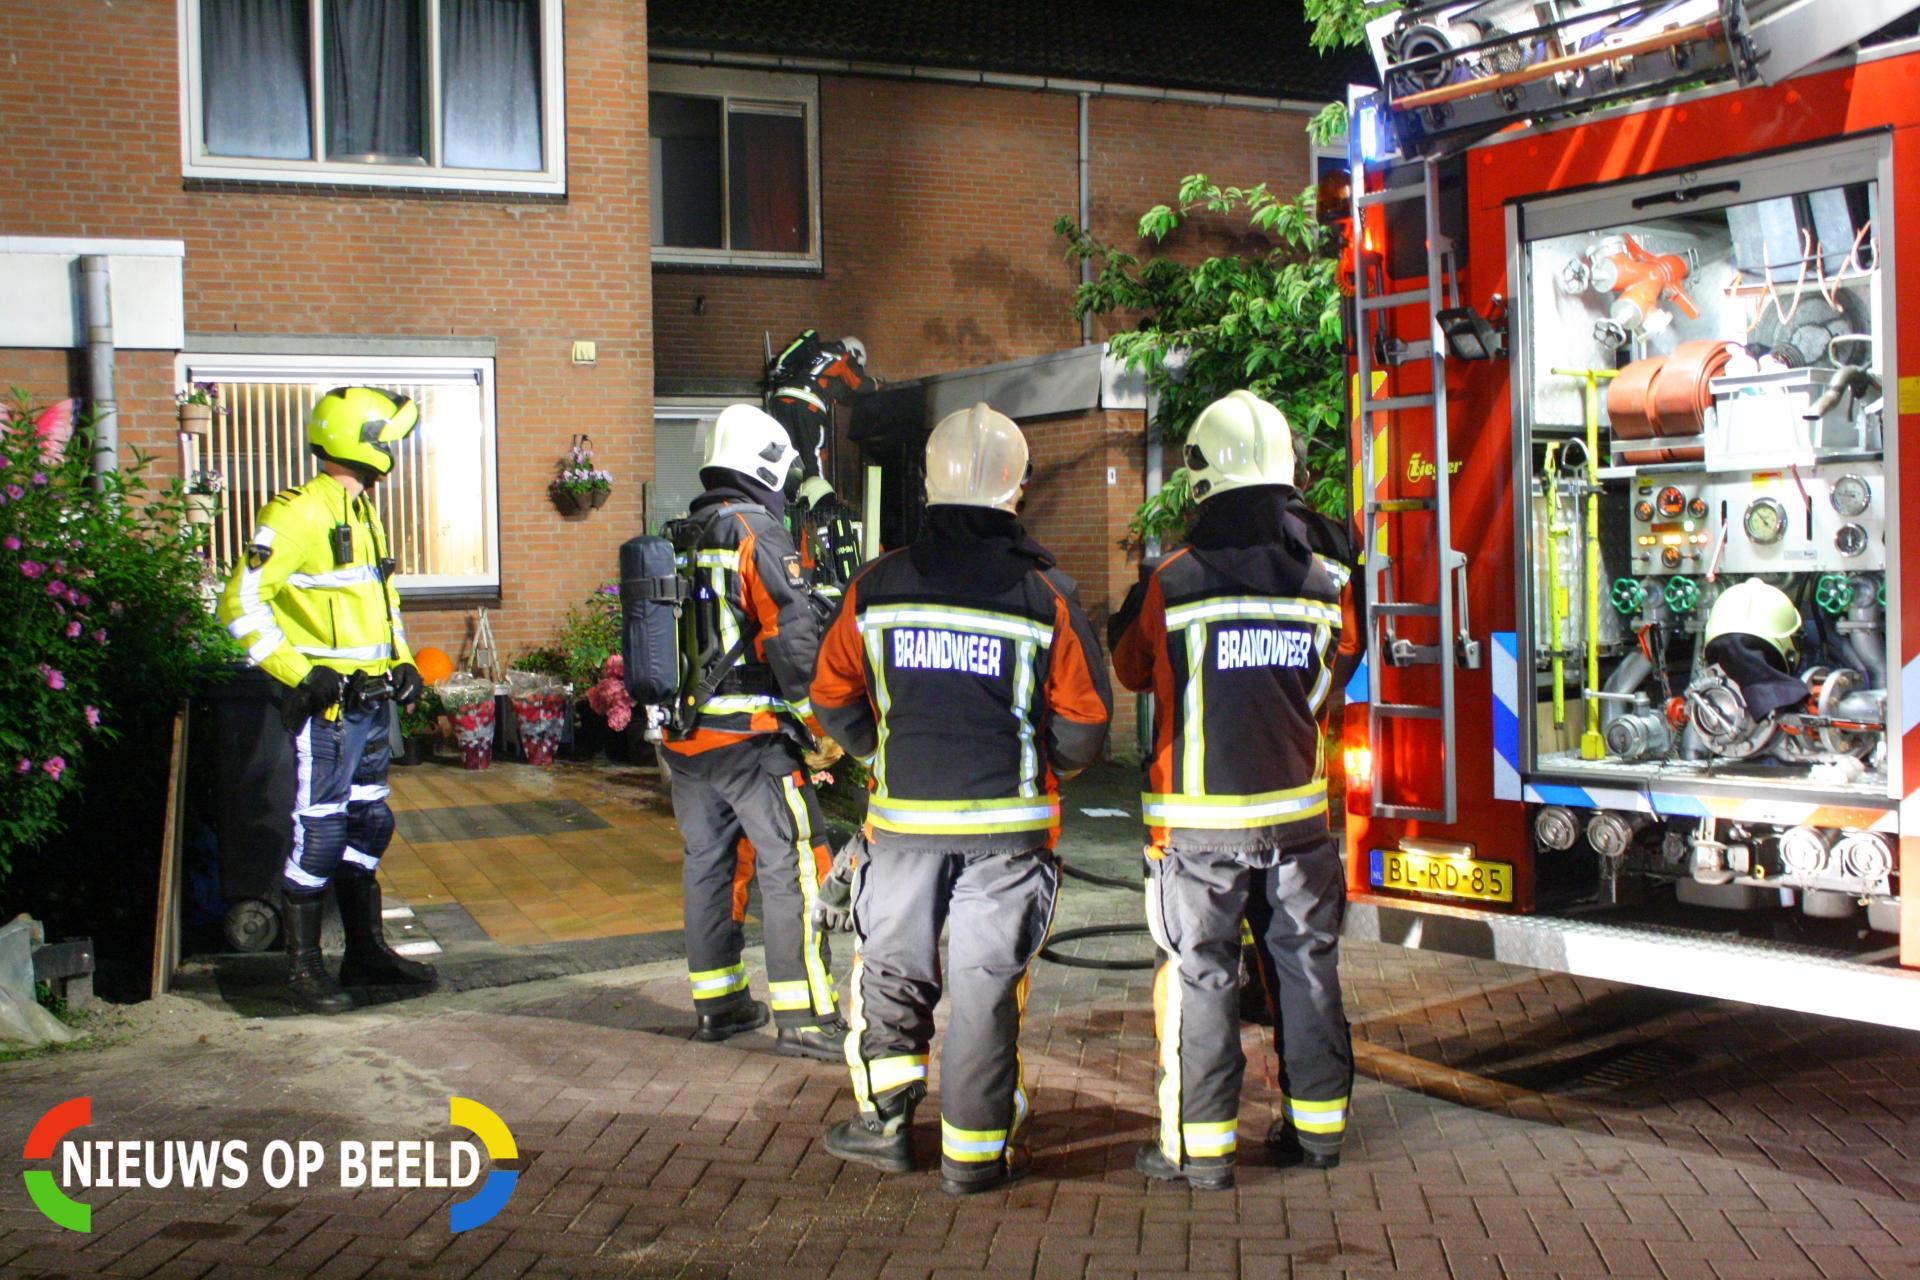 Aanhouding en fikse schade na woningbrand Gans Zoeterwoude